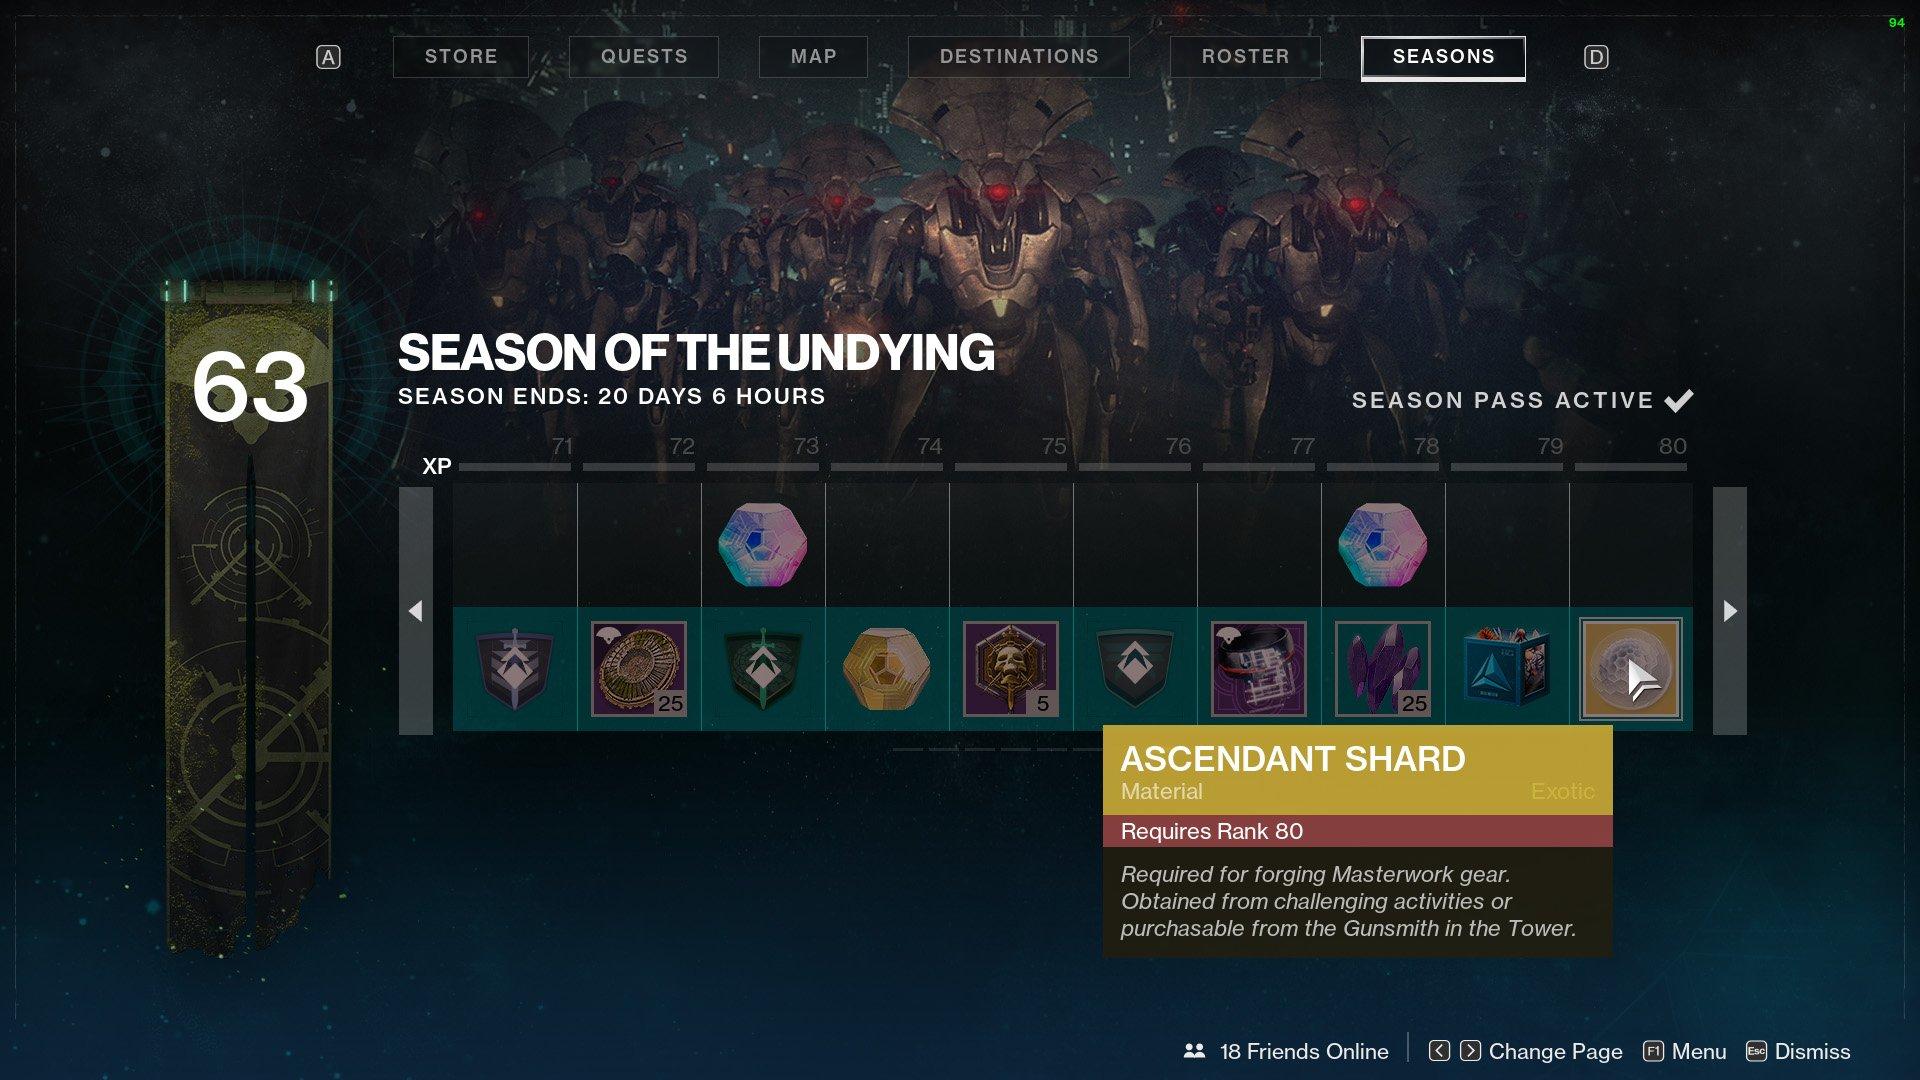 destiny 2 ascendant shard season pass